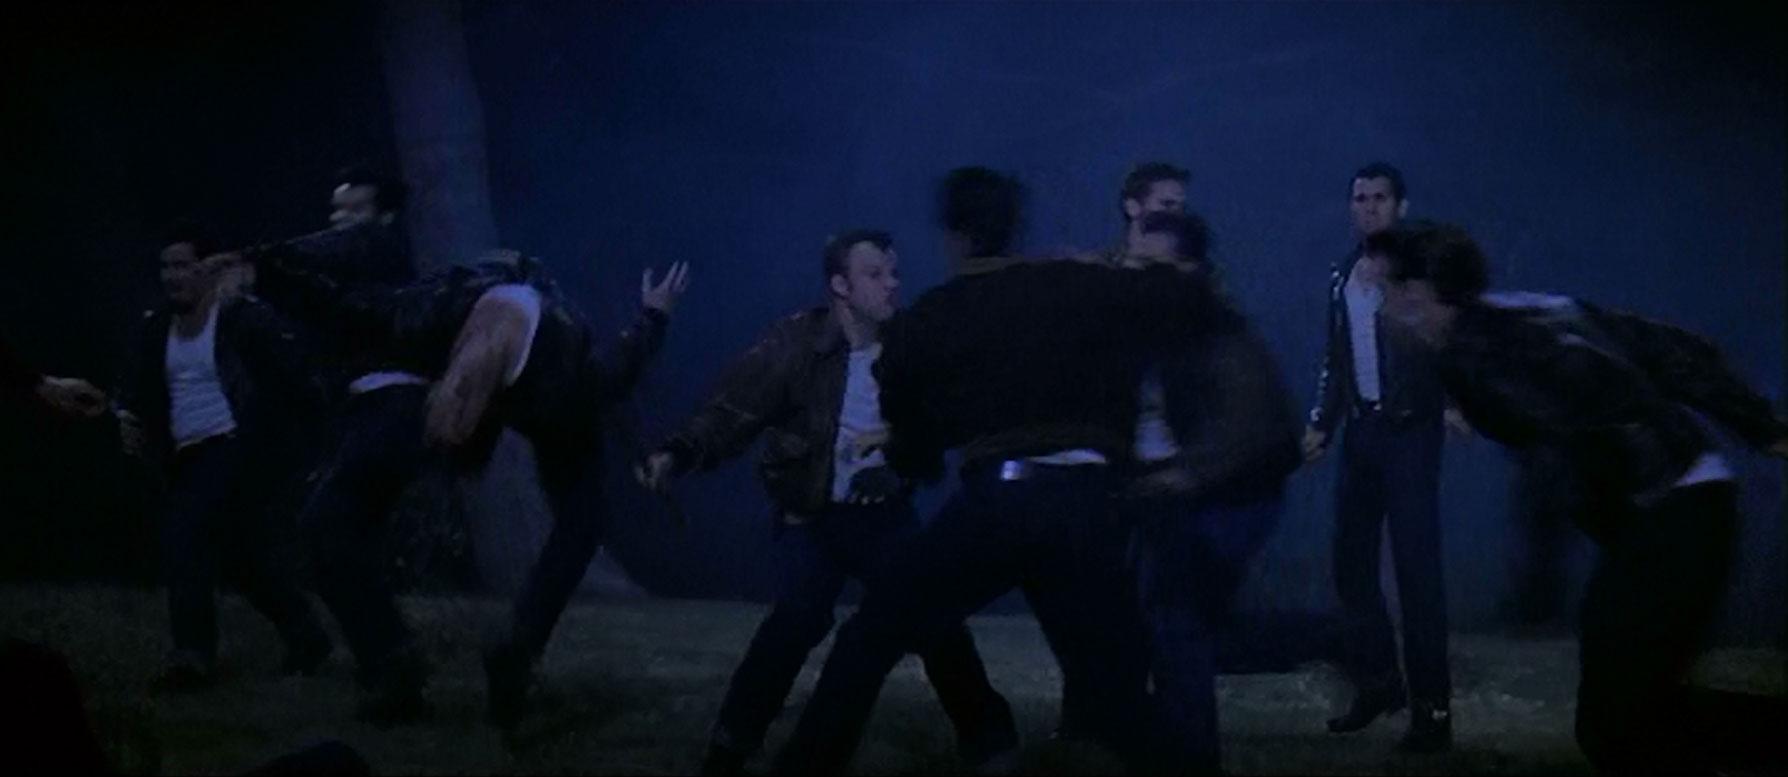 Stunt Fight Choreograpy